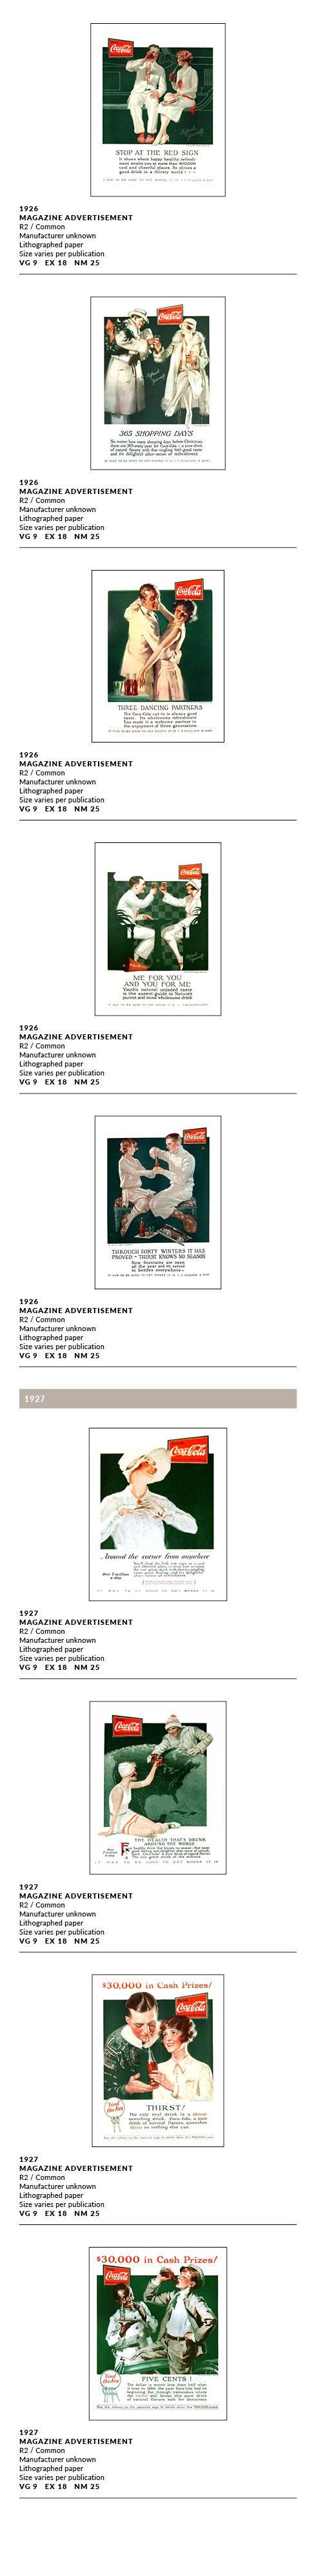 1925-29 Ads_3.jpg